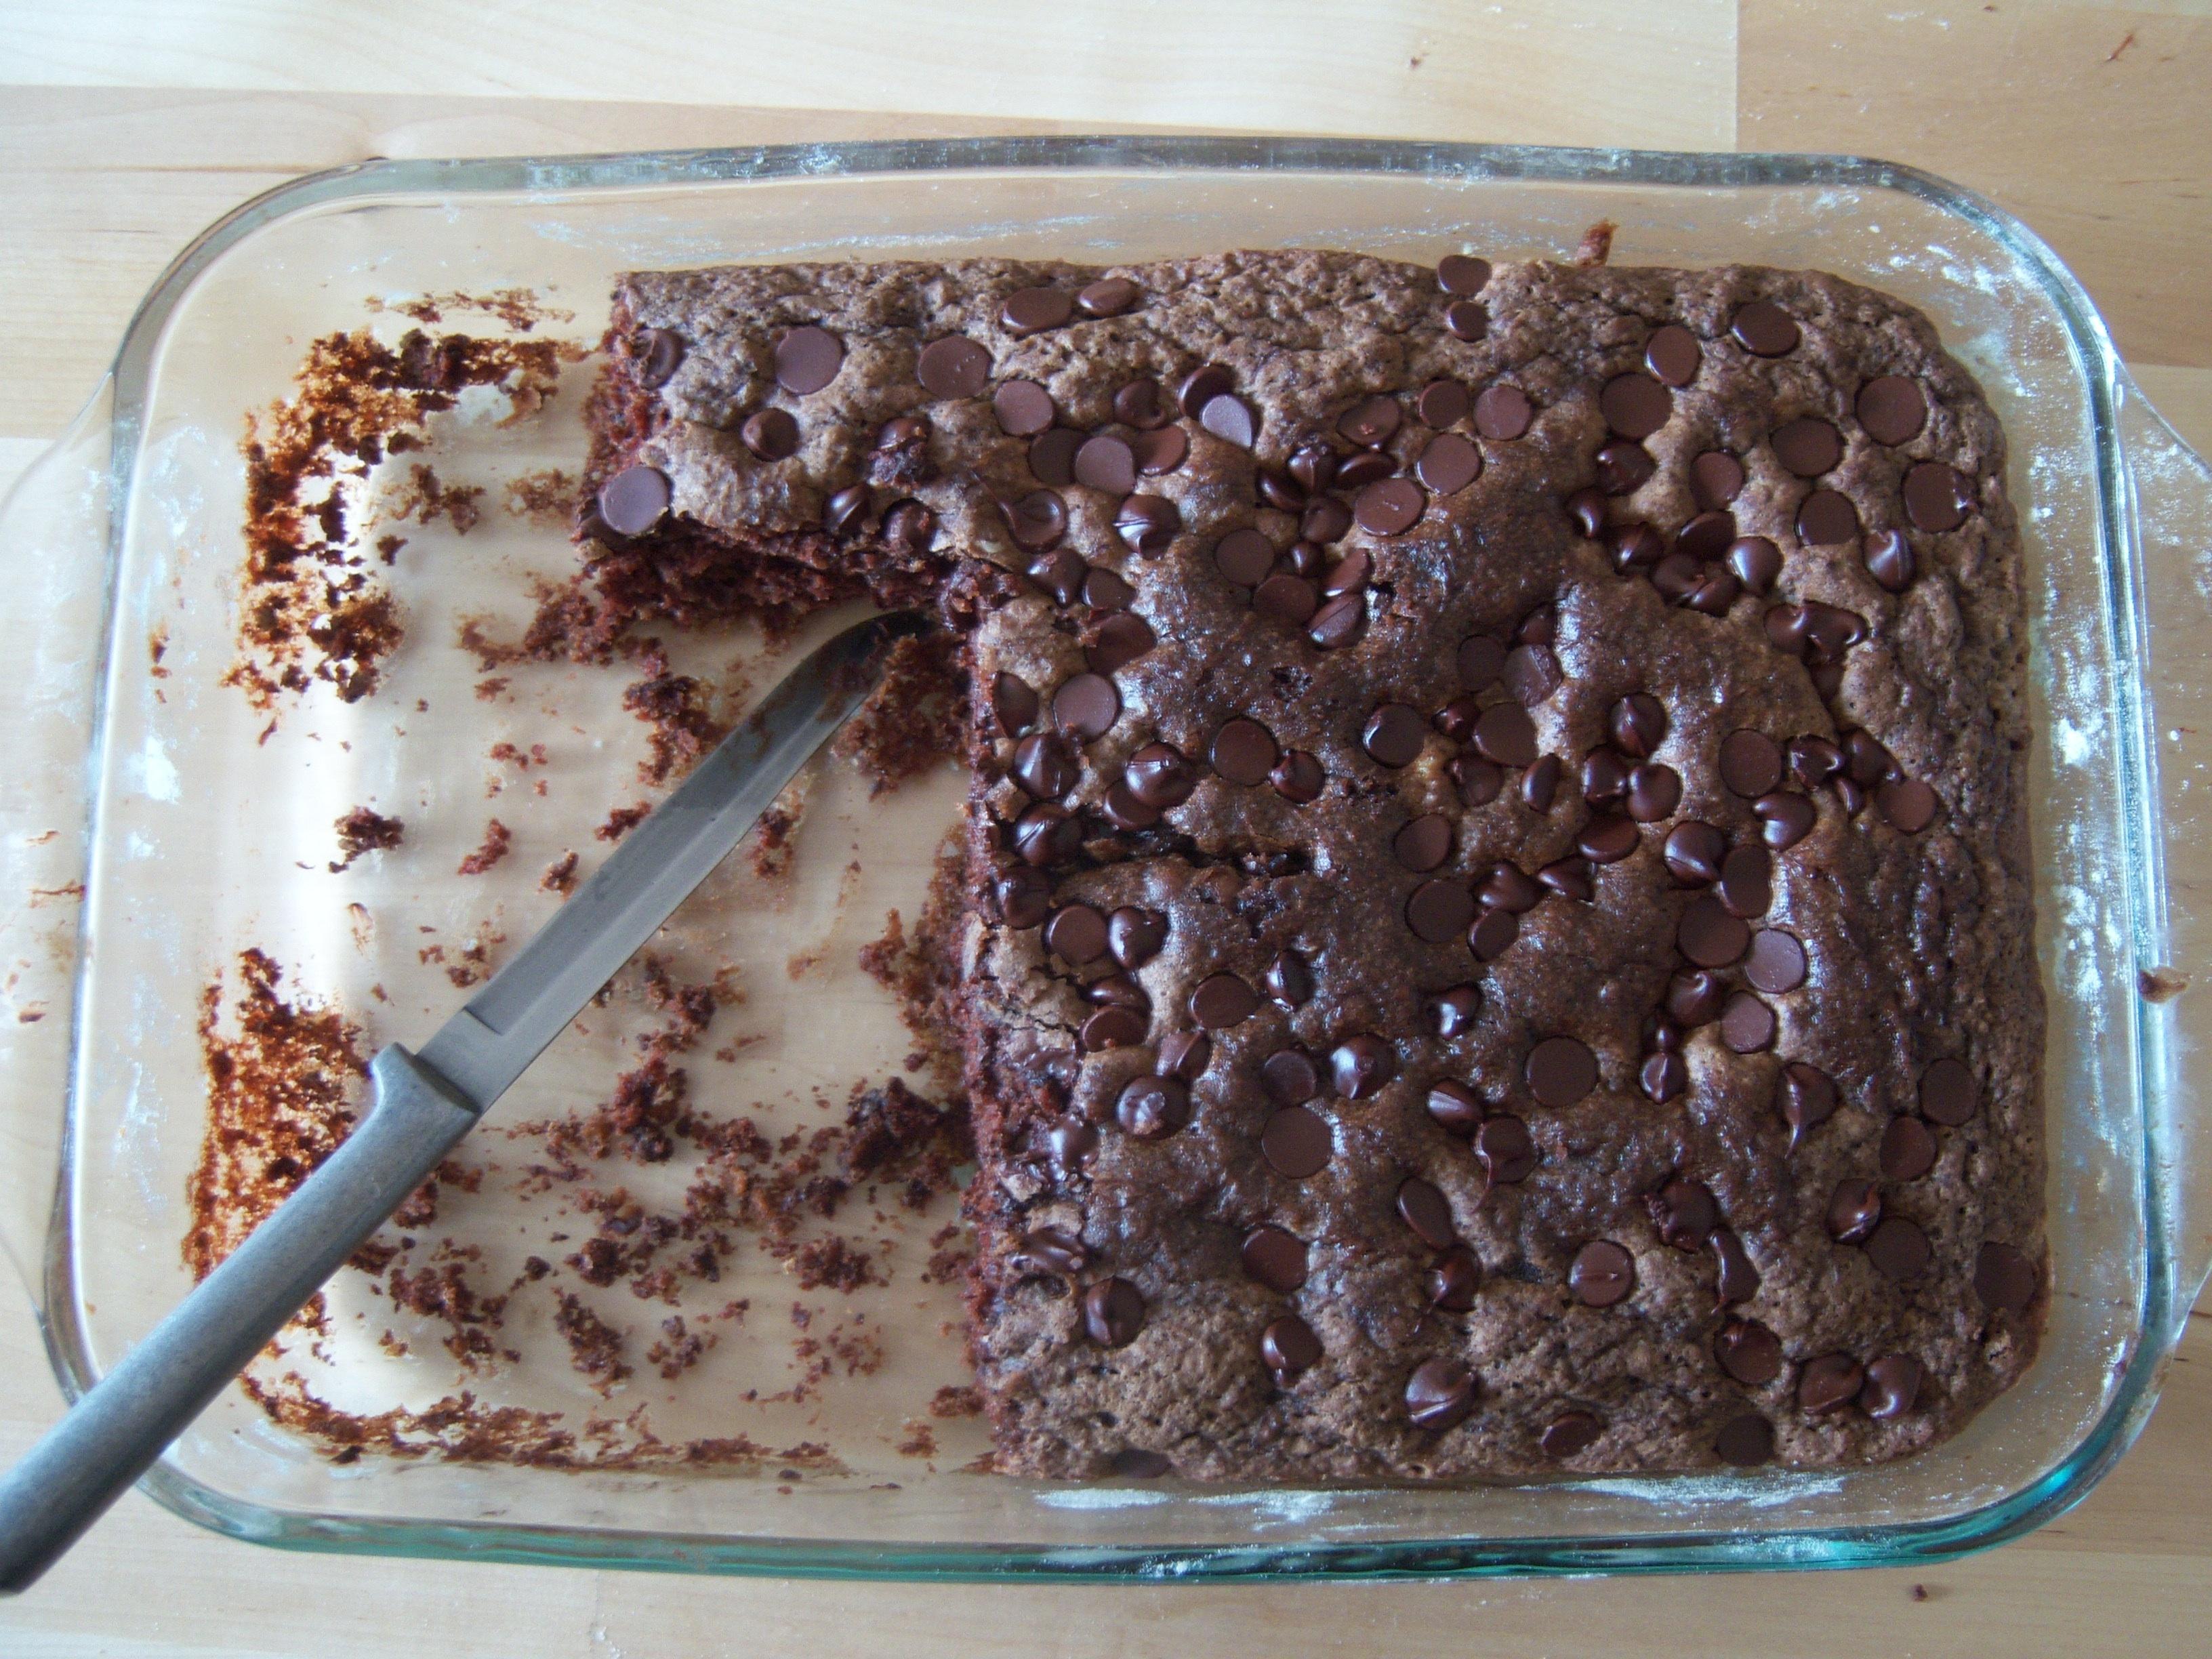 chocolate-cake-top.jpg